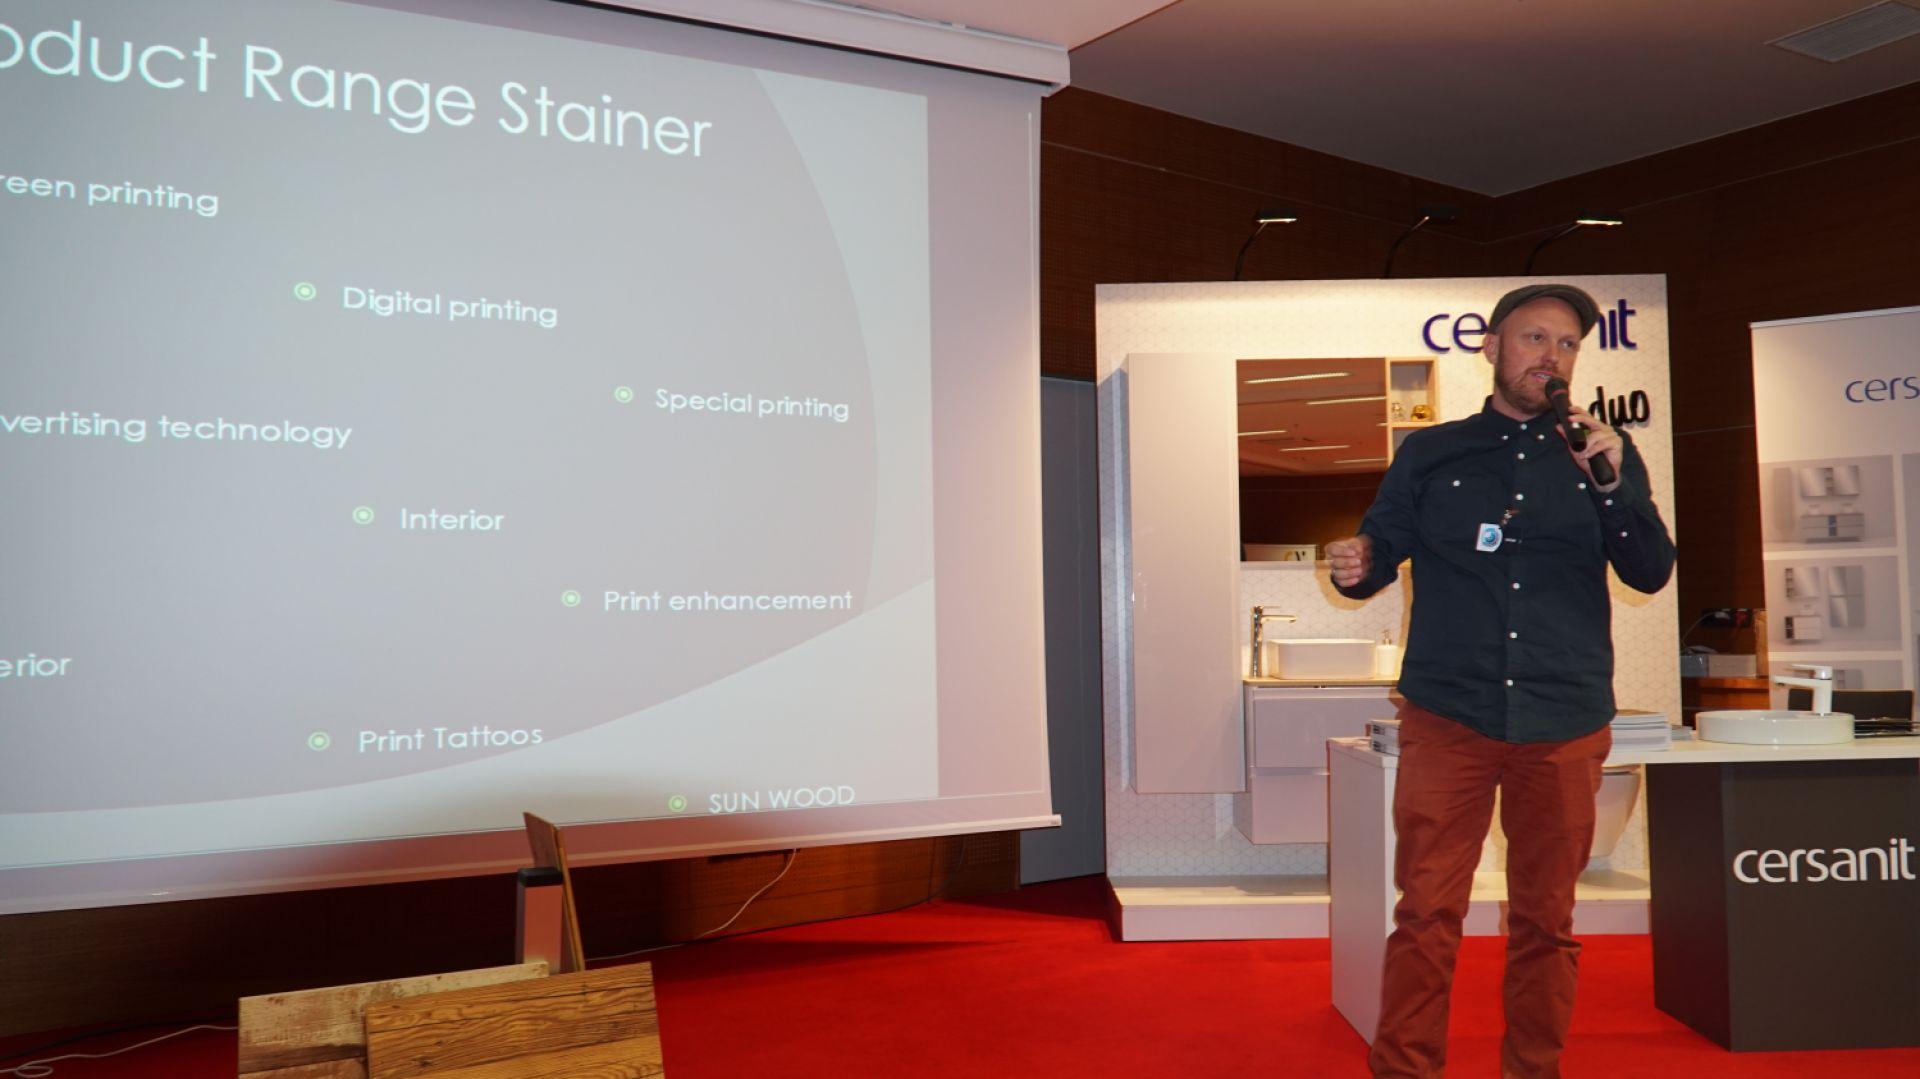 Tom Lackner z firmy Sunwood Steiner, CDO Centrum Drewna i Oklein